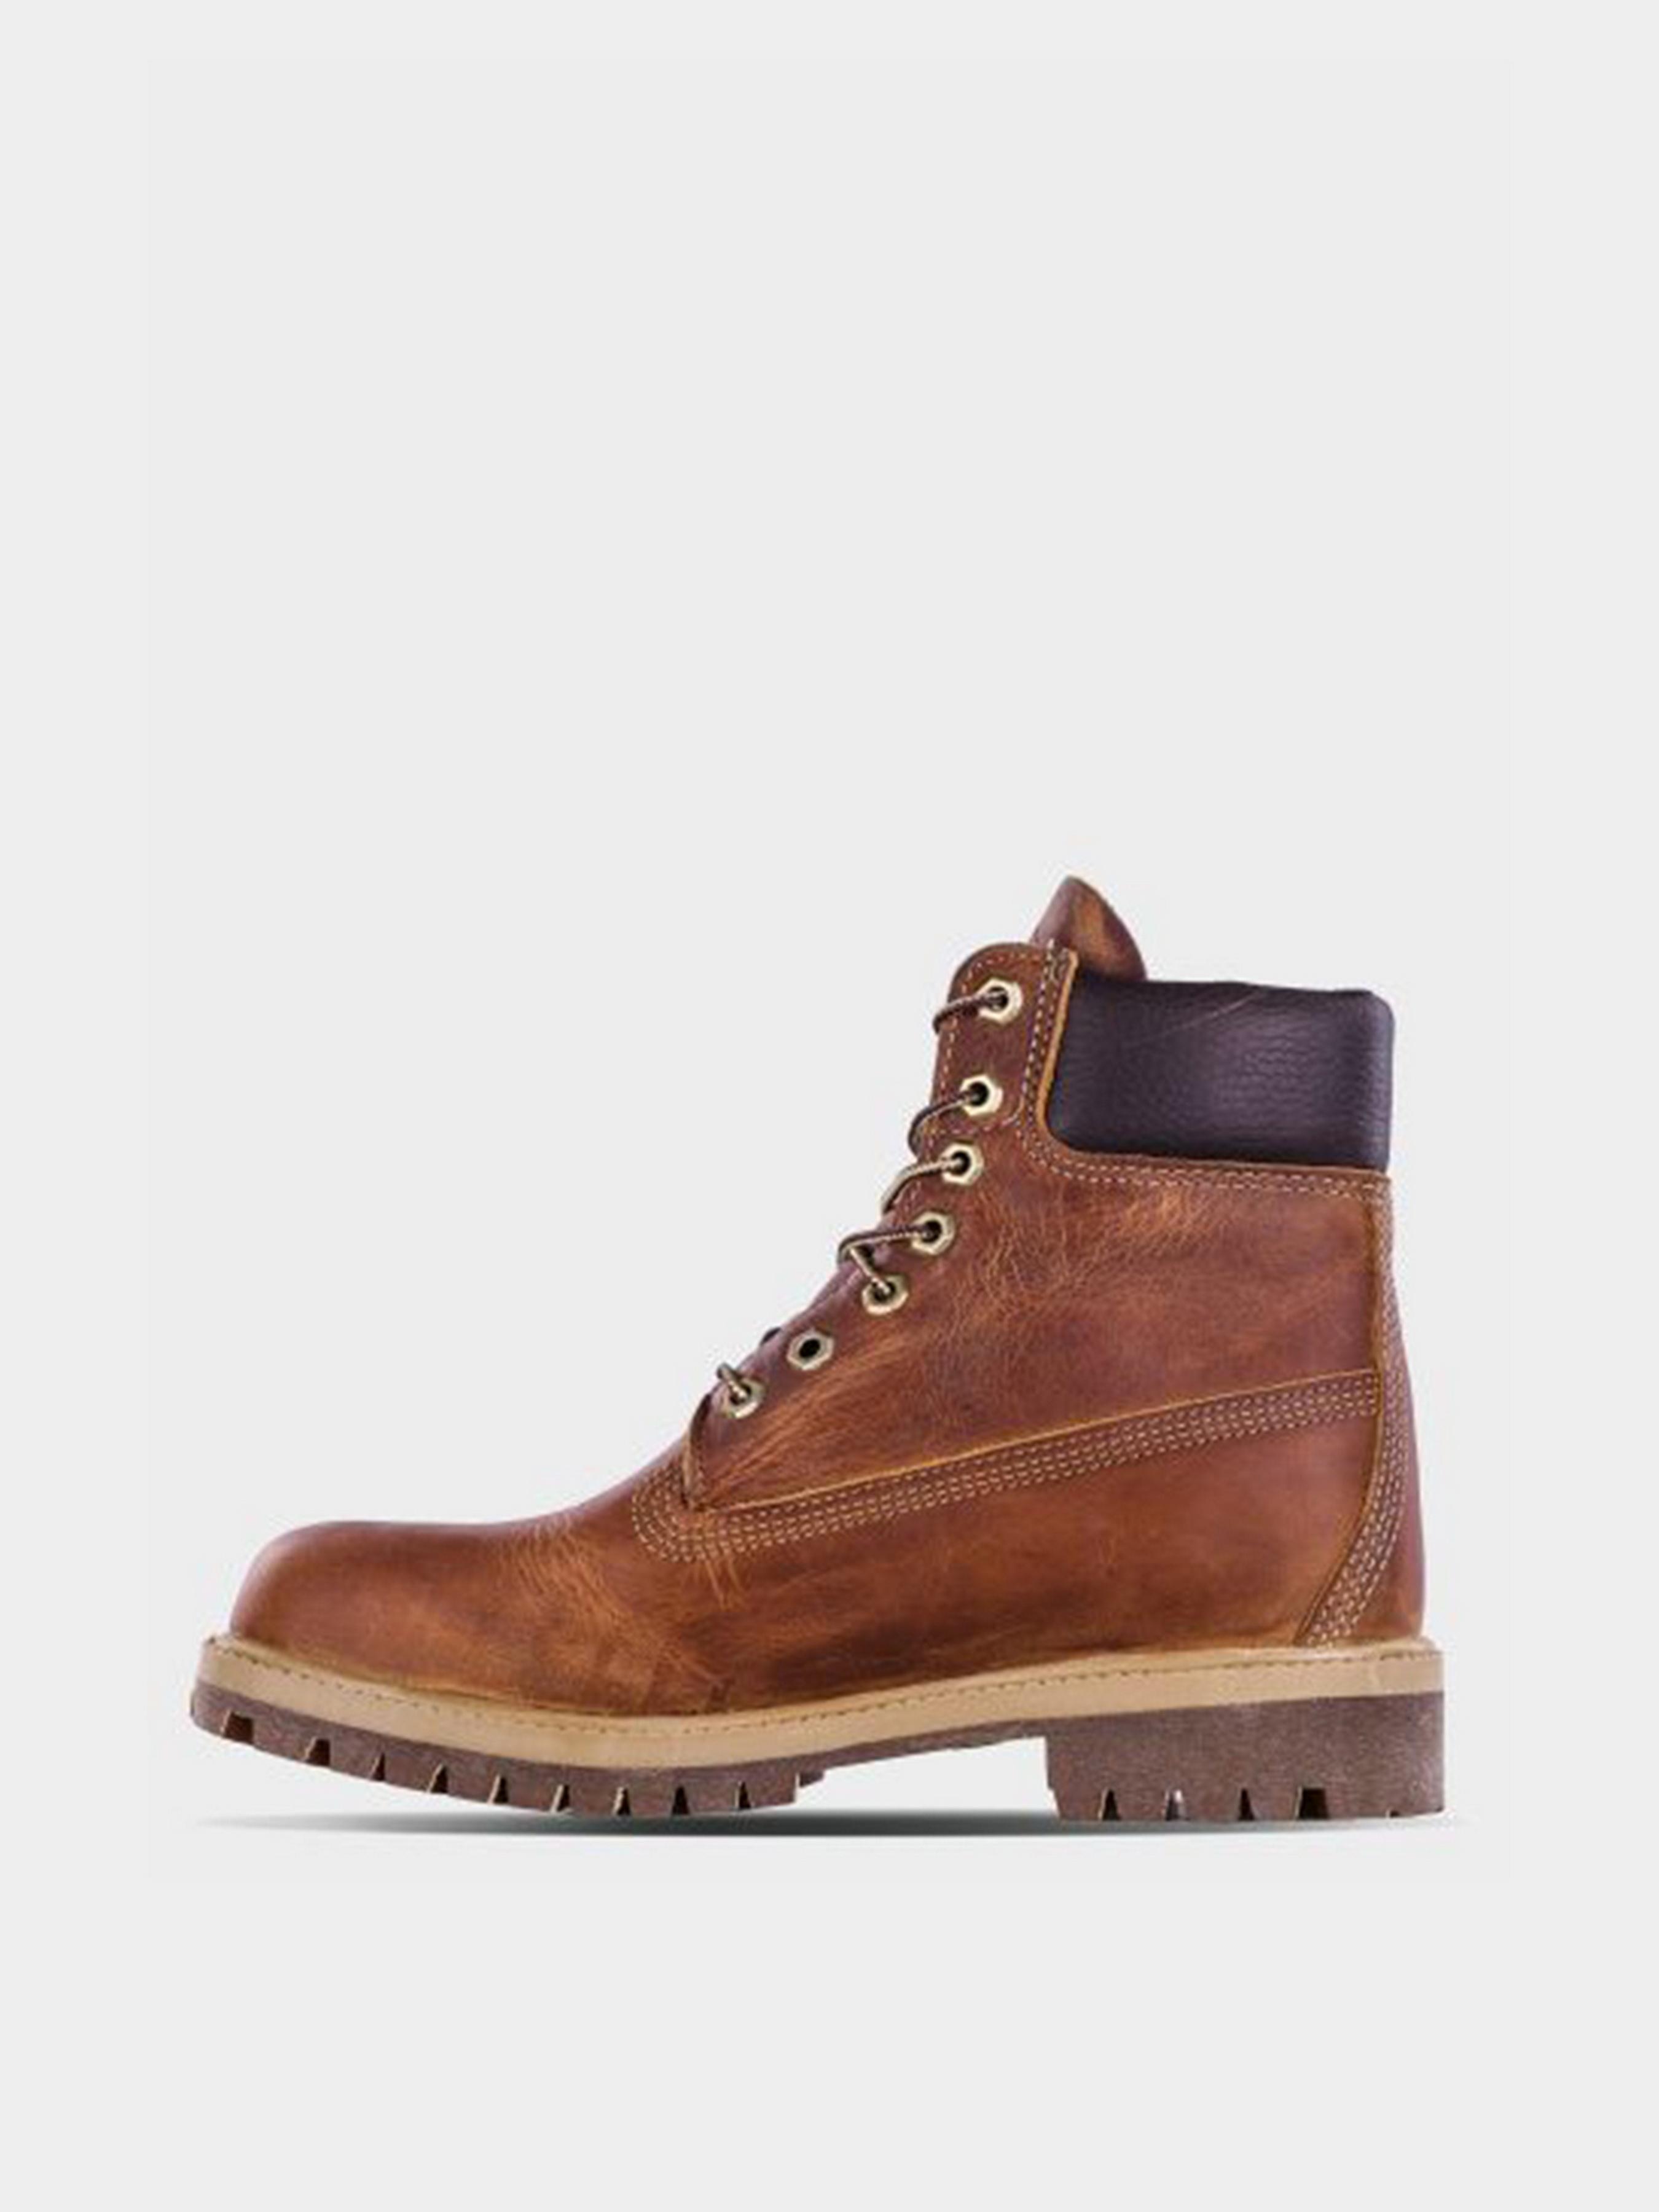 Ботинки для мужчин Timberland Timberland Premium TF4043 фото, купить, 2017